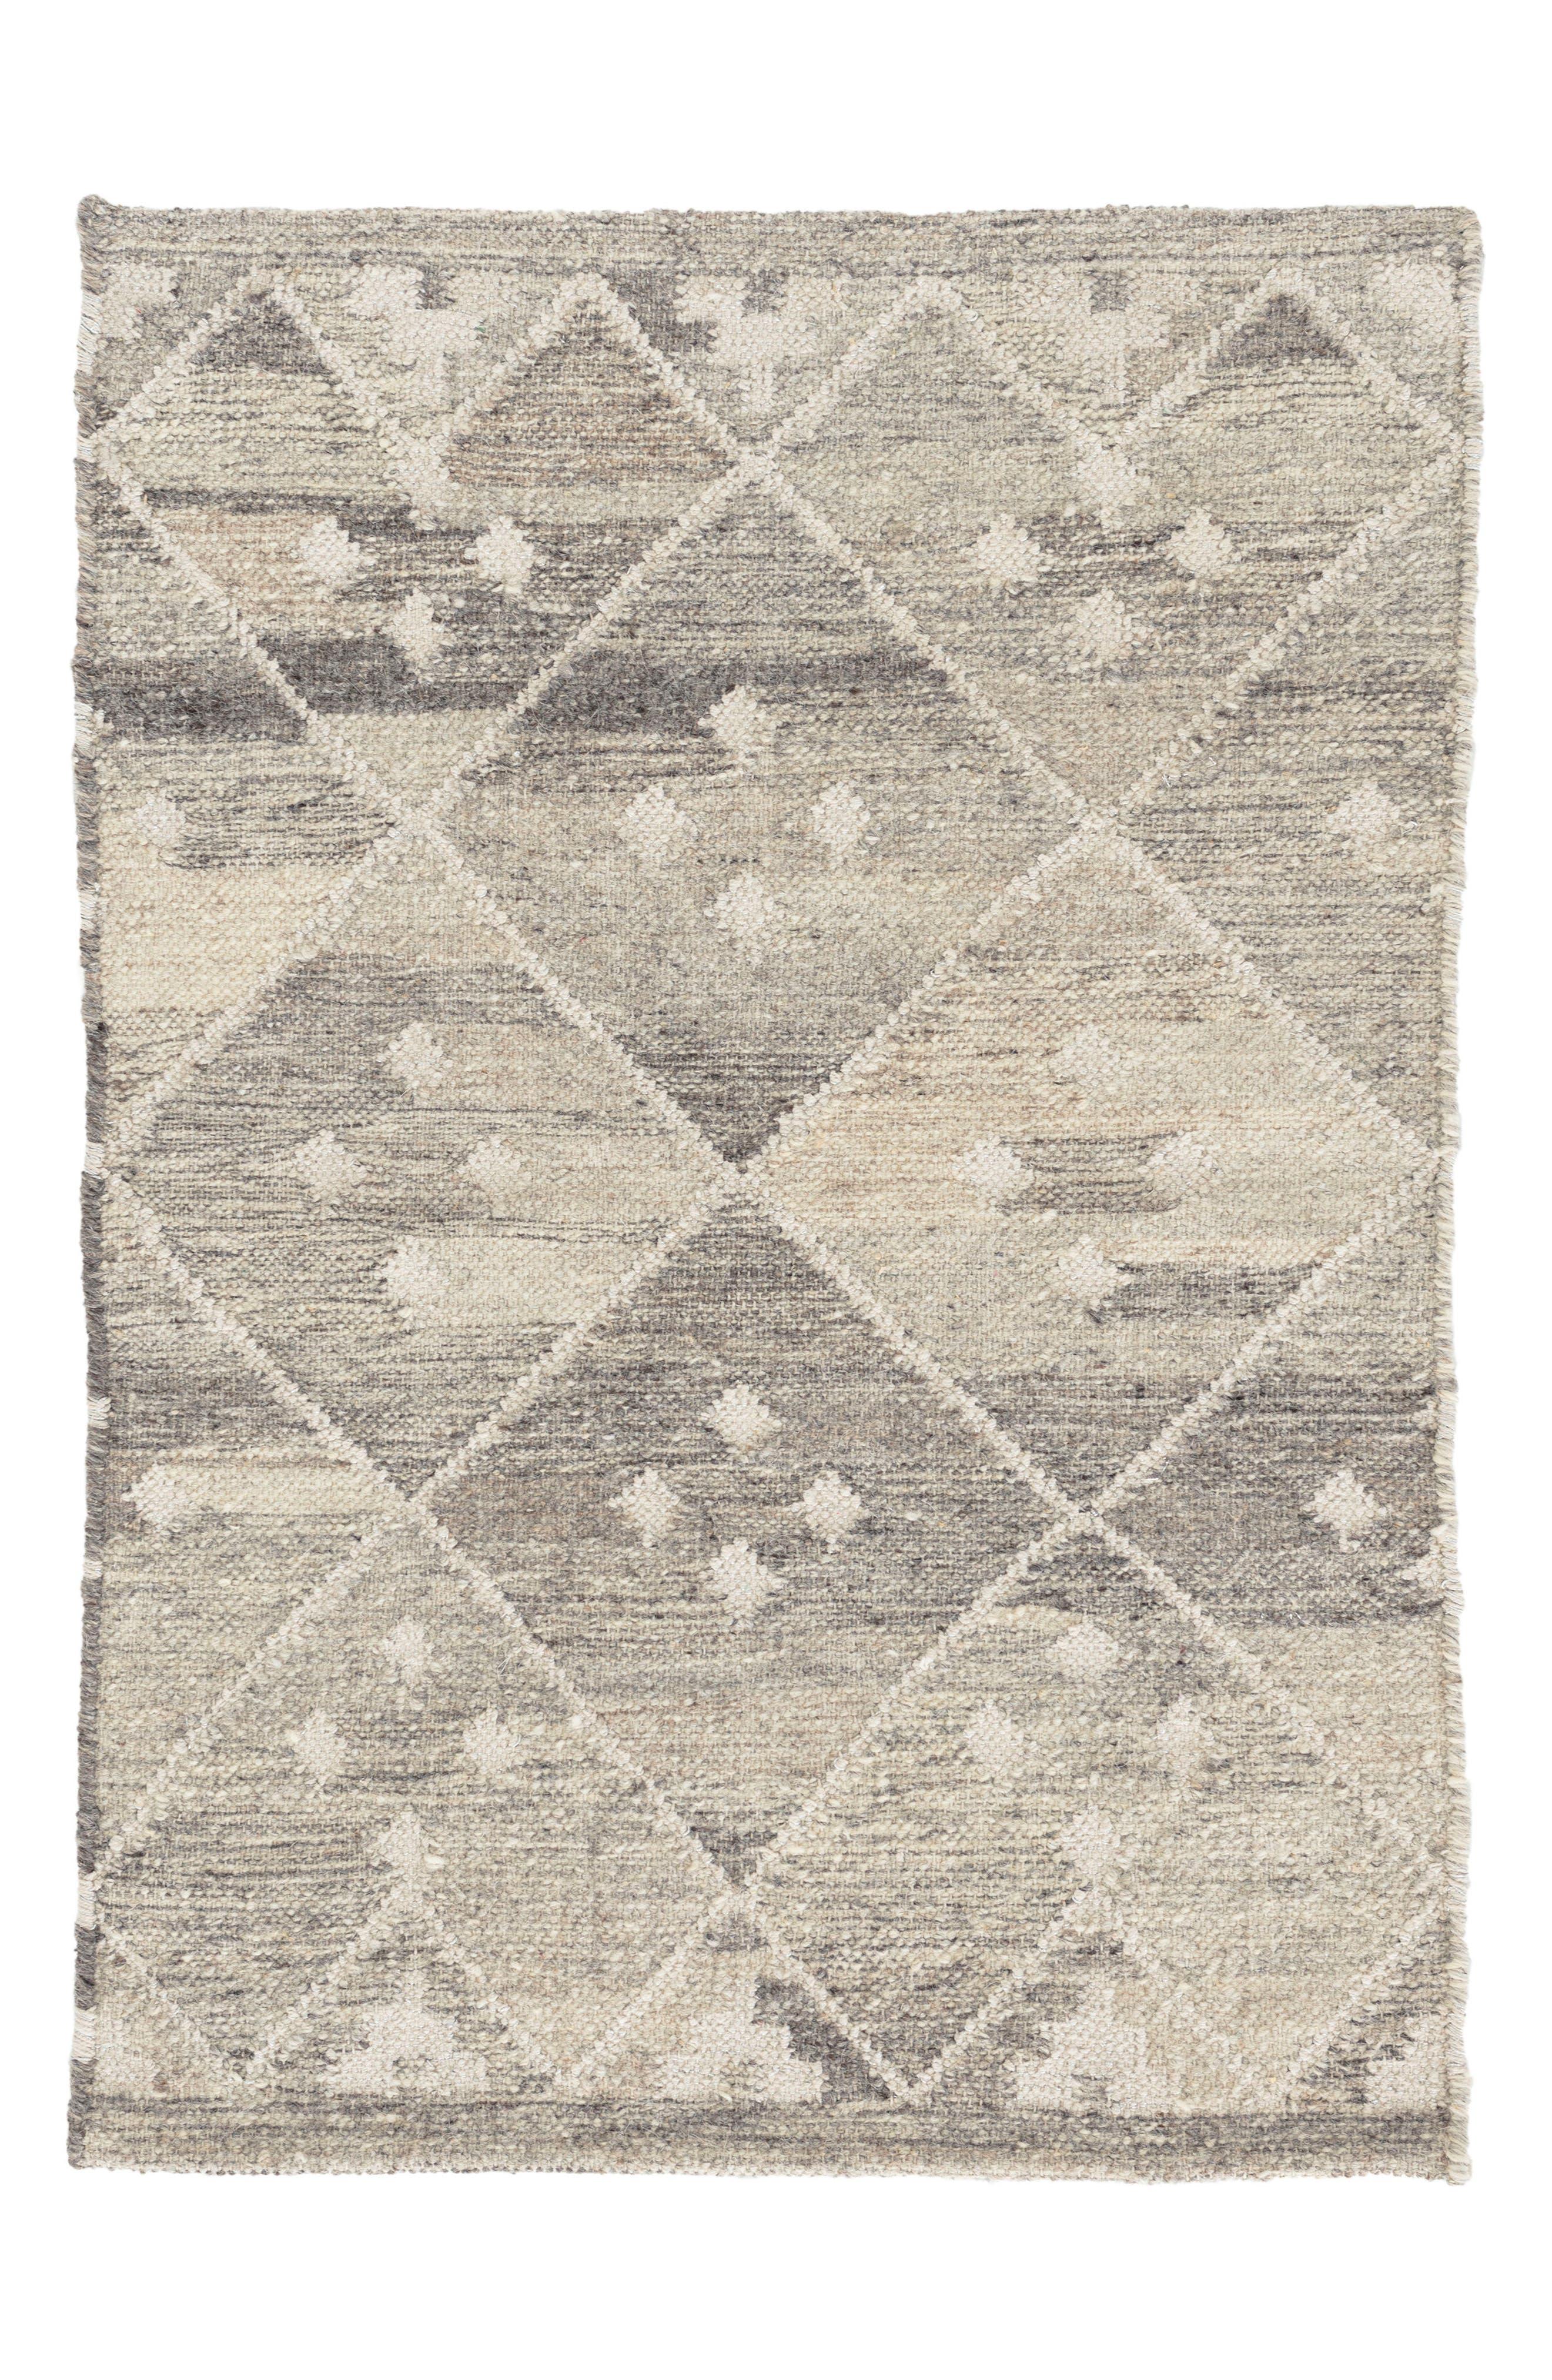 Kota Woven Wool & Cotton Rug,                             Main thumbnail 1, color,                             Neutral